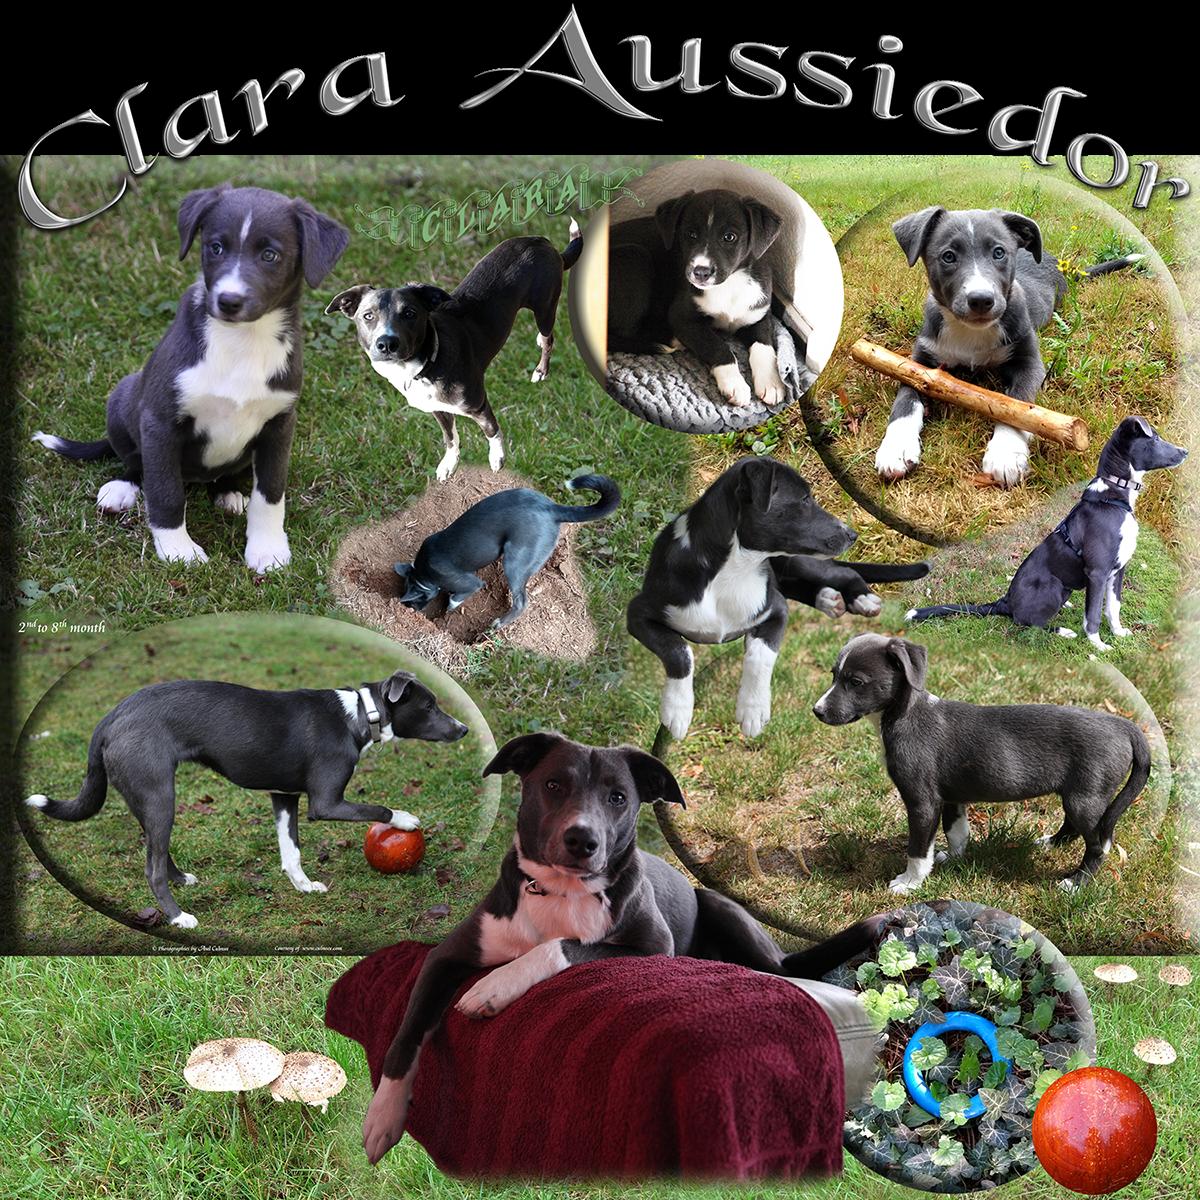 Clara Aussiedor decet July 2020 - February 2021